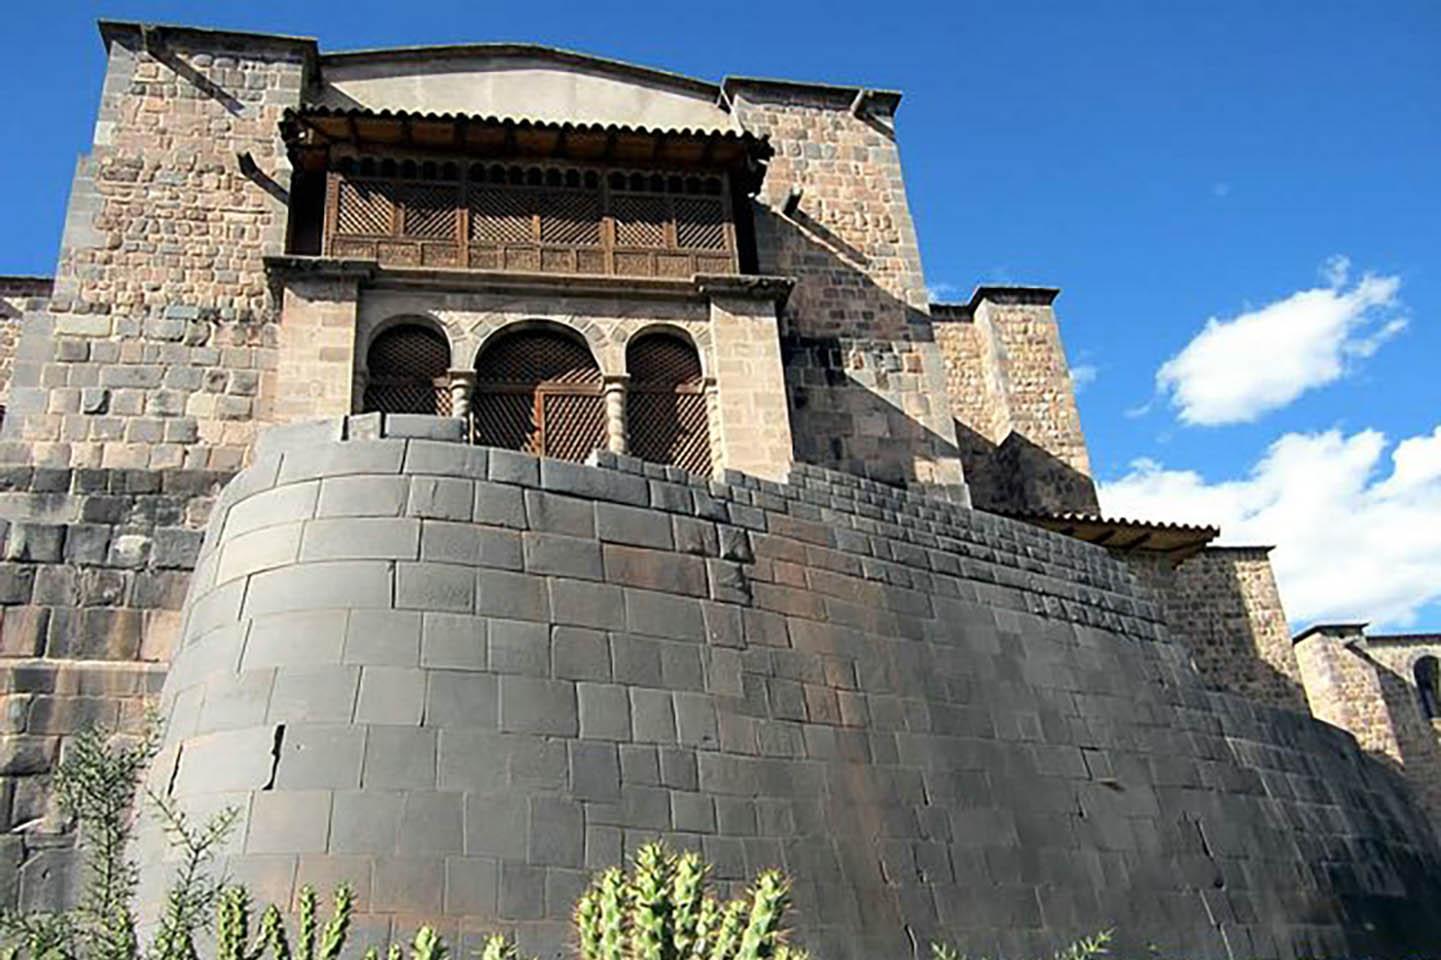 Qoricancha the temple of the sun